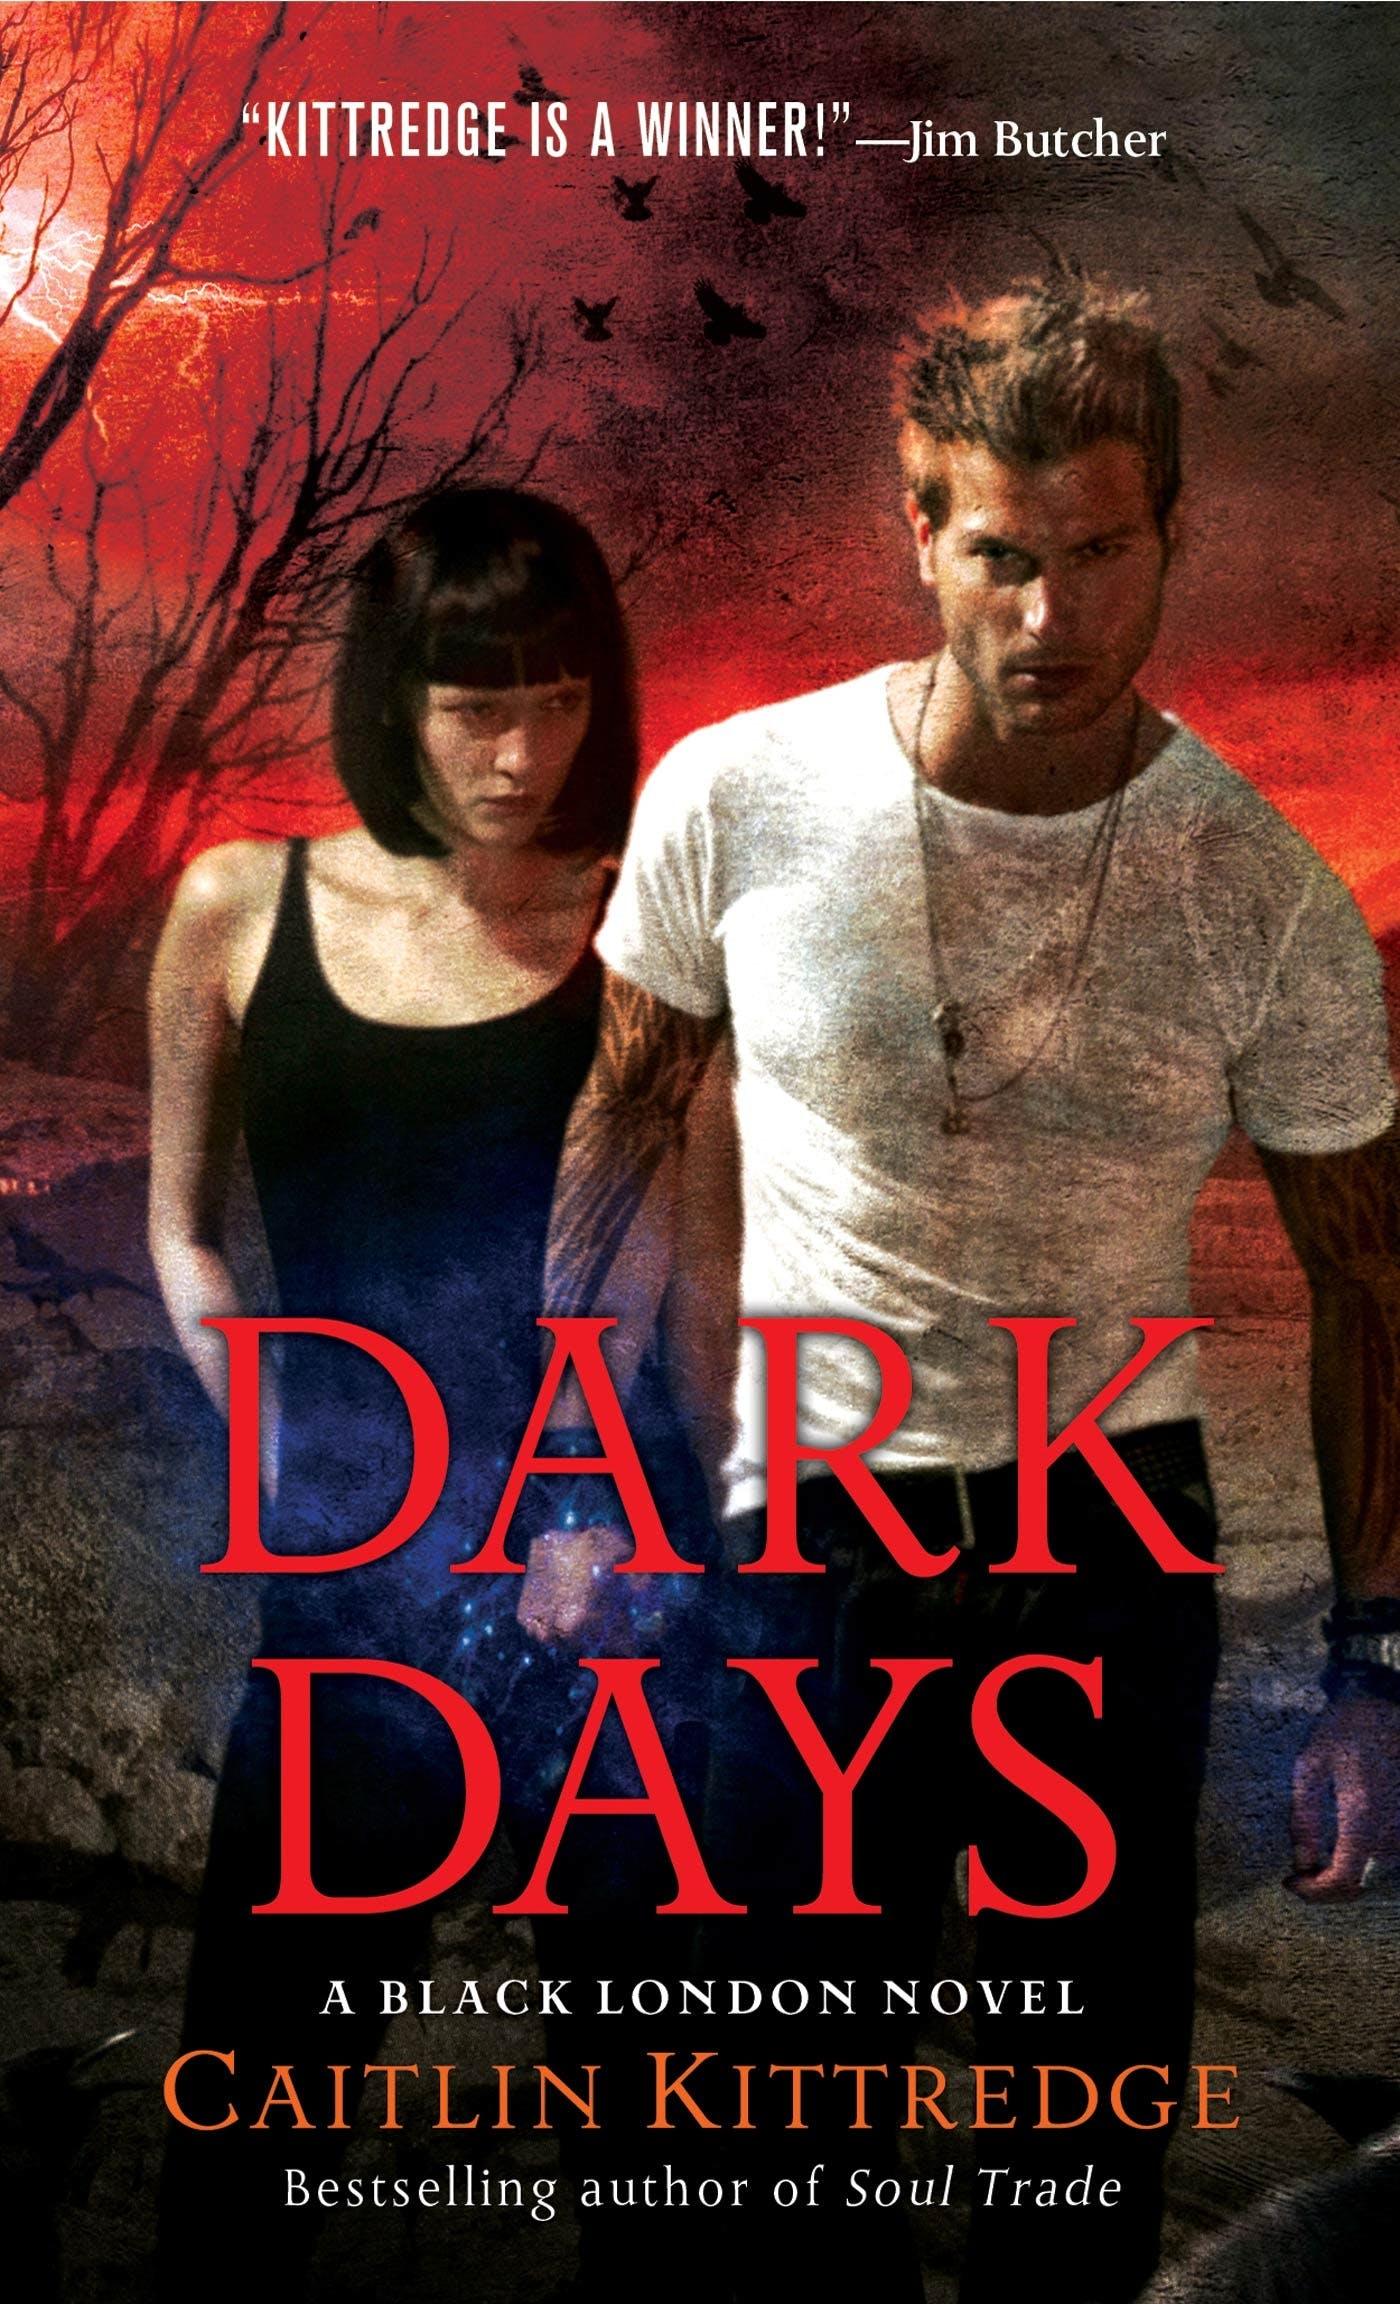 Image of Dark Days